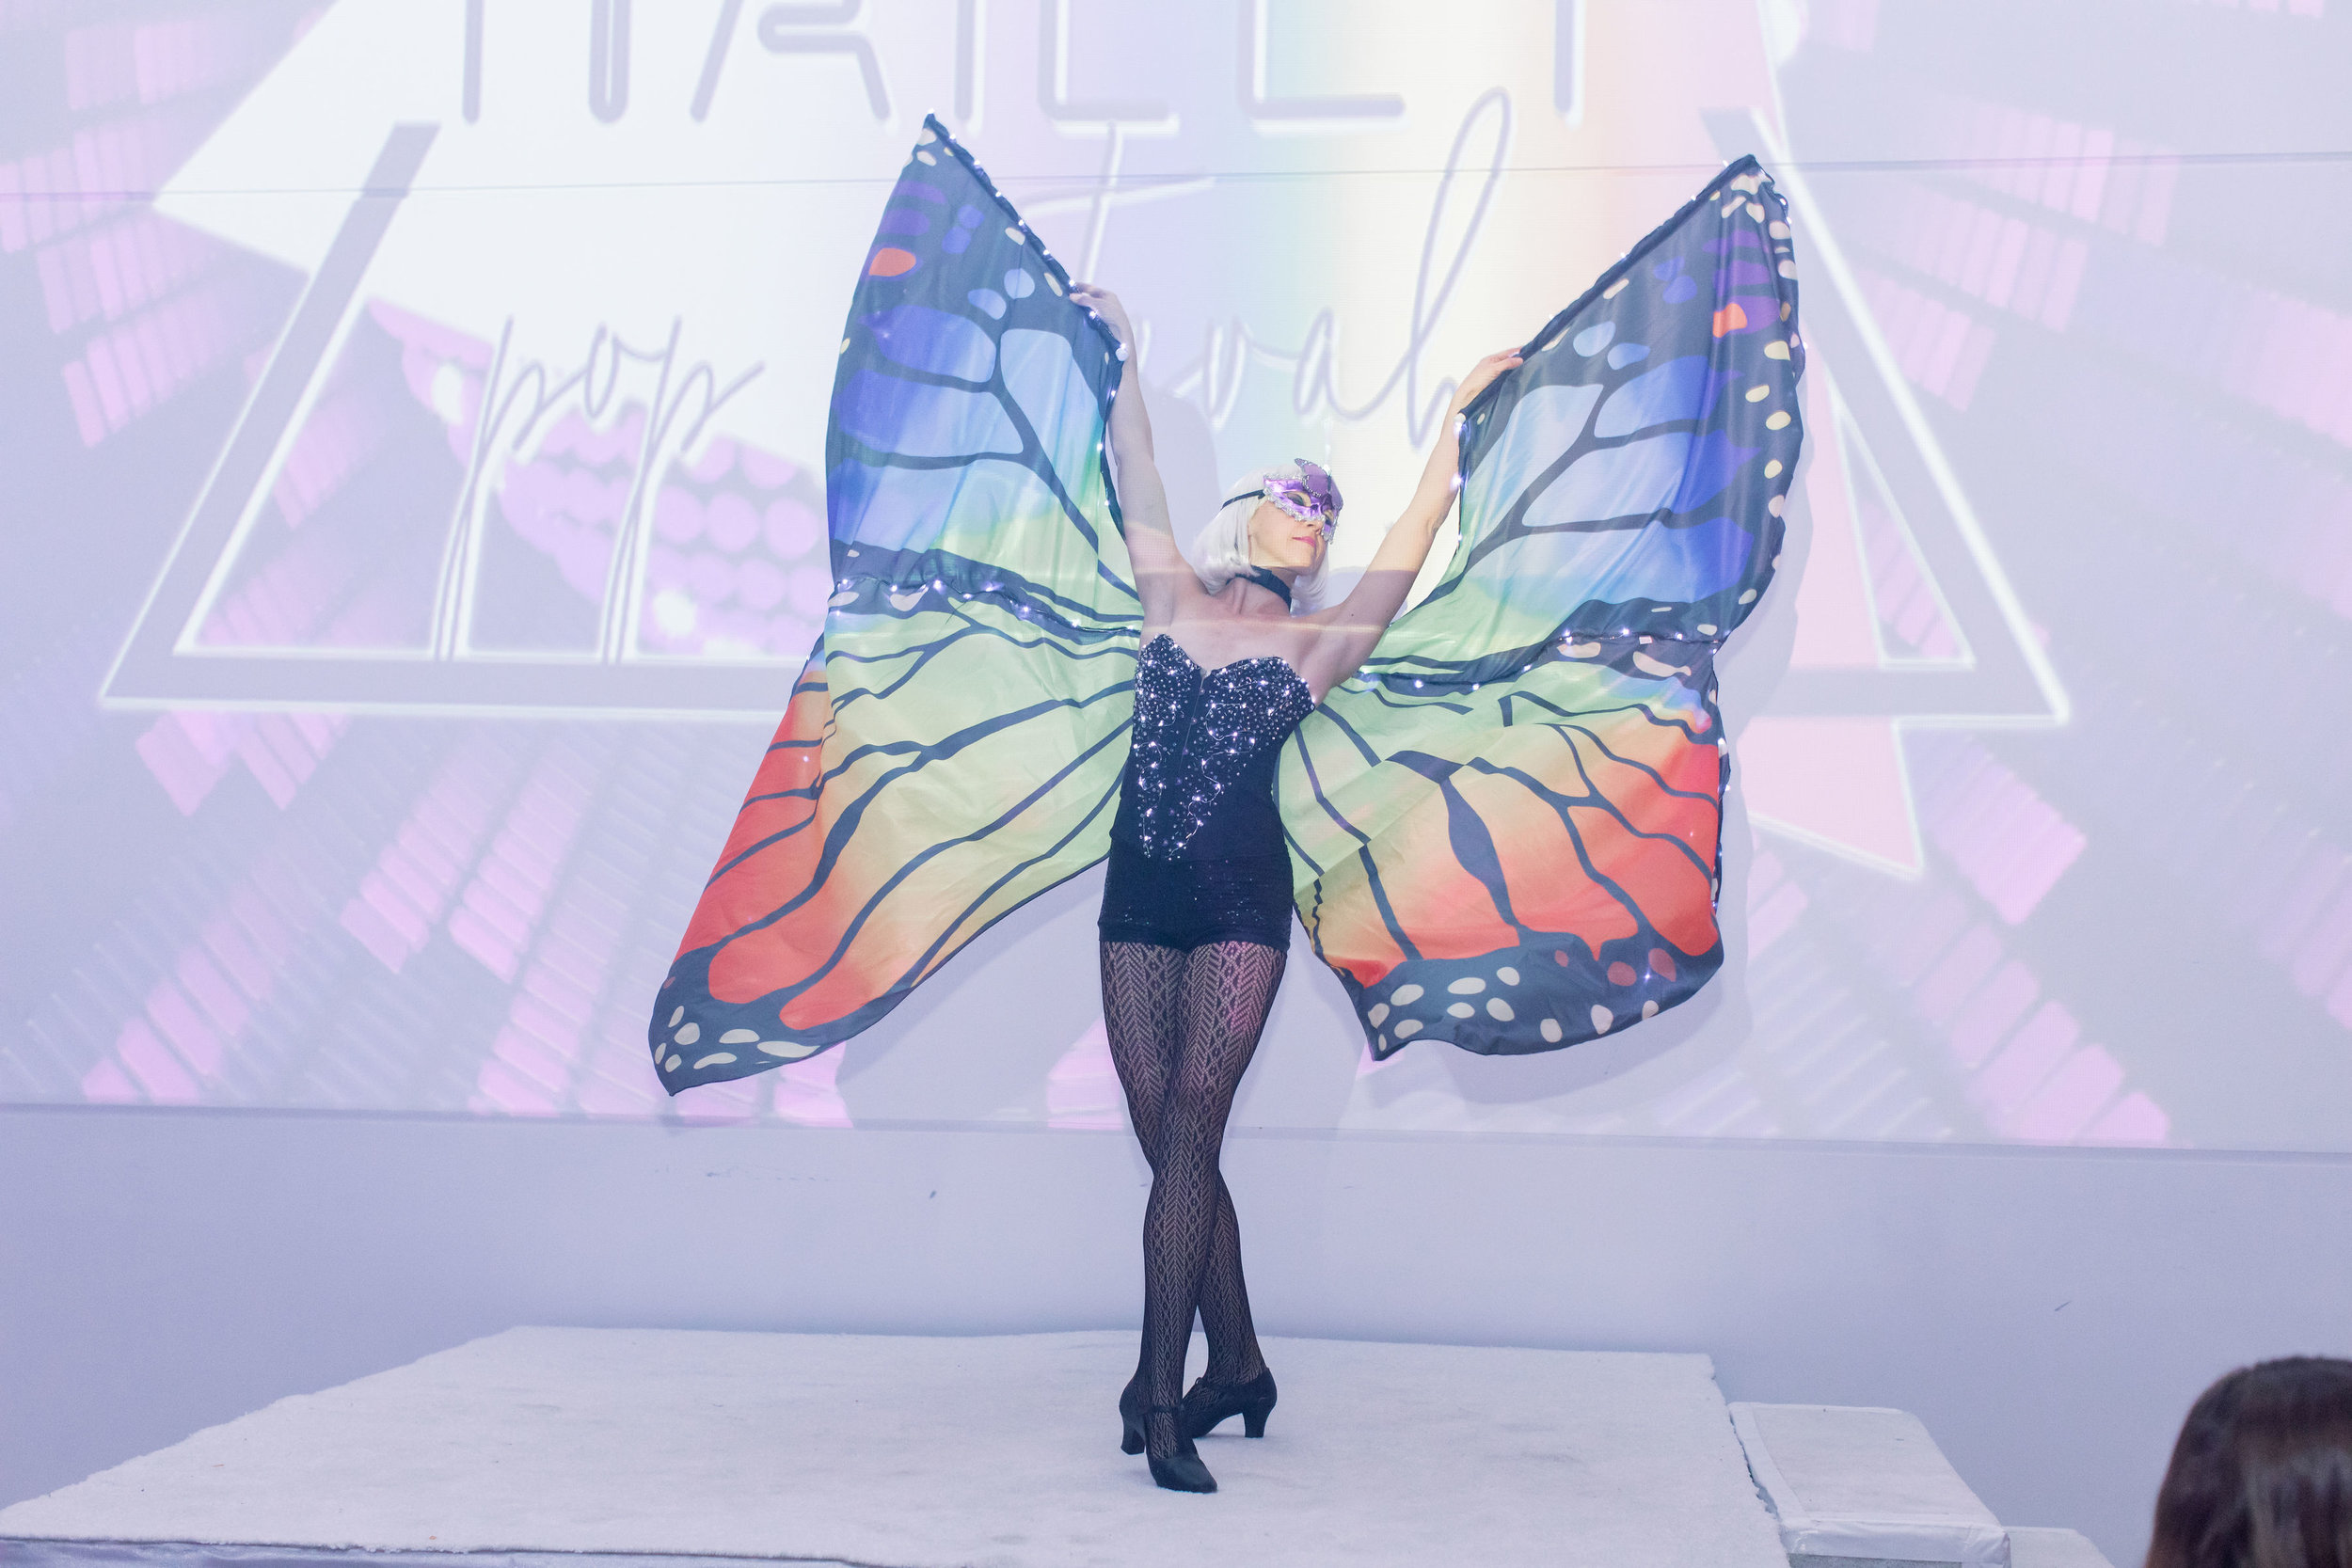 46 rainbow bat mitzvah butterfly wing glow dancer bat mitzvah party entertainment custom light projection Life Design Events photos by Stephanie Heymann Photography.jpg